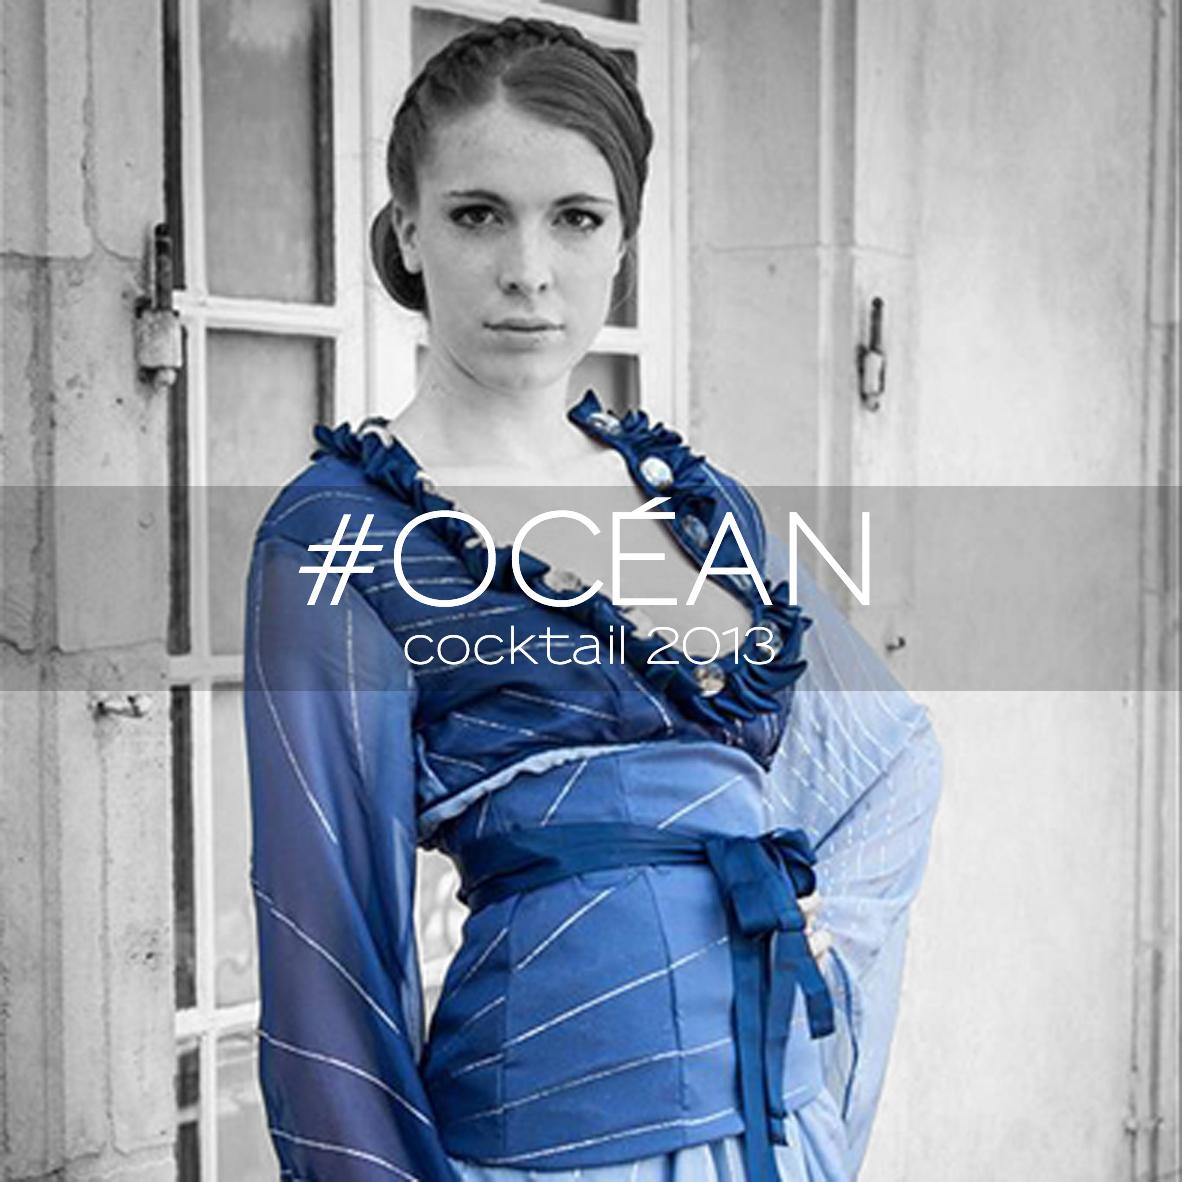 OCEAN cocktail 2013 - Fabienne Dimanov Paris